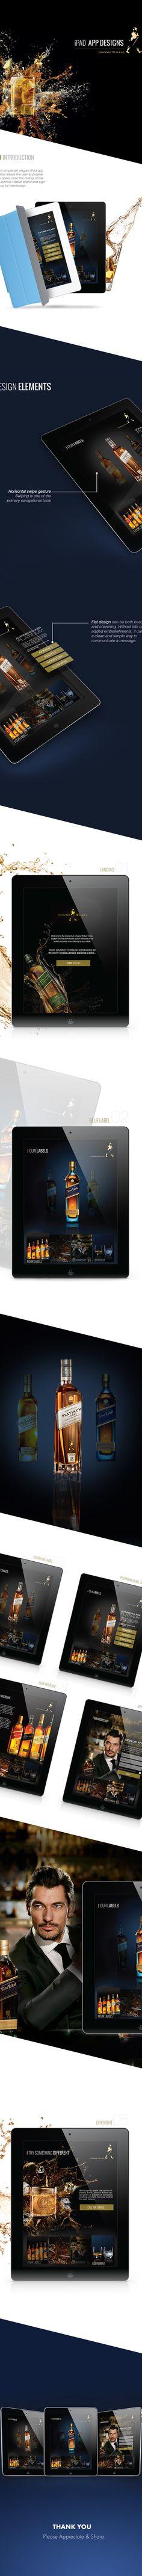 Johnnie Walker iPad App Design Concept on Behance